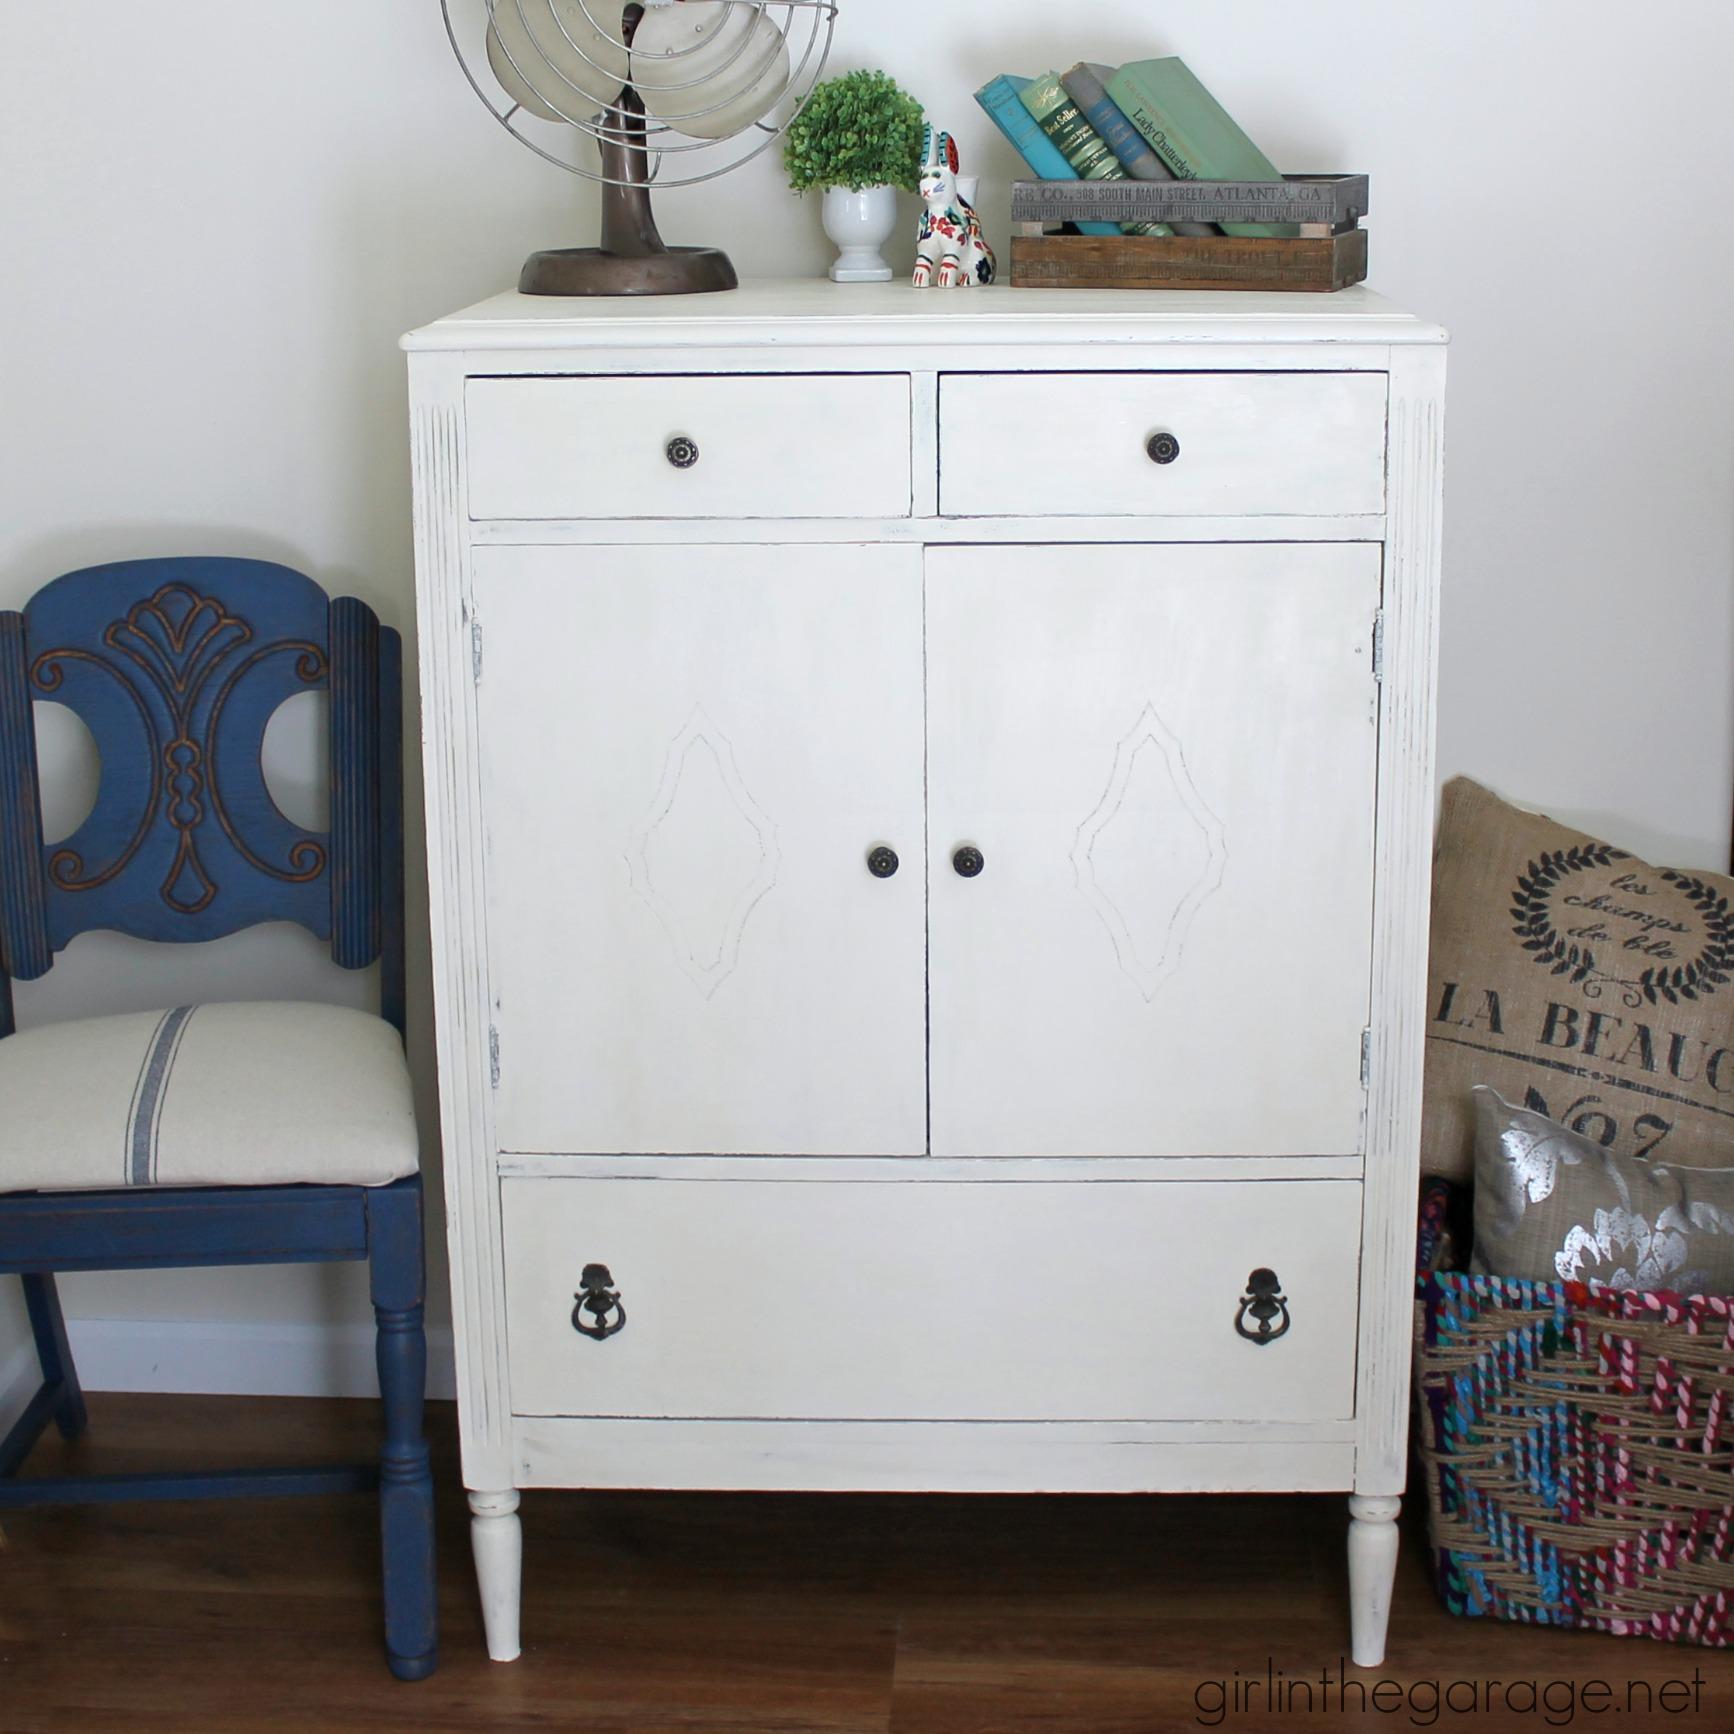 Antique Dresser in Old White Chalk Paint | Girl in the Garage®